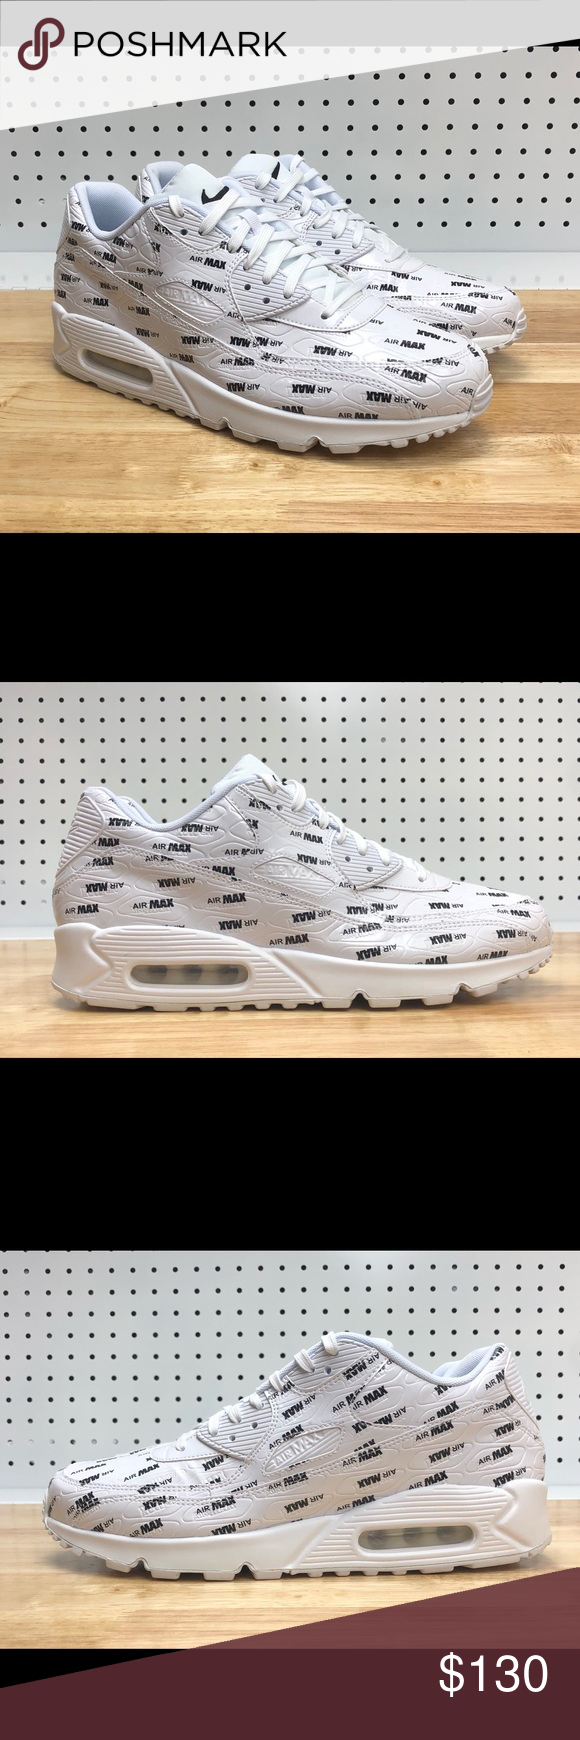 online retailer c0ff5 1c116 Nike Air Max 90 Premium White Classic Black Print Men s Nike Air Max 90 PRM  White